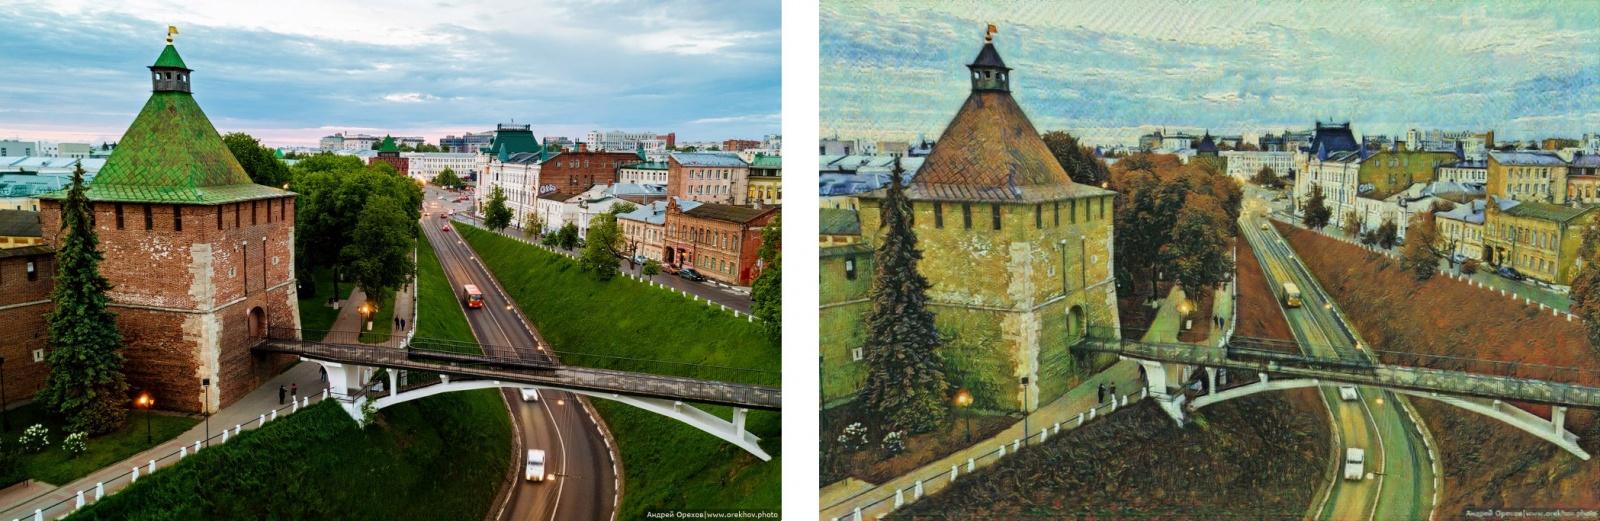 opencv4arts: Нарисуй мой город, Винсент - 1